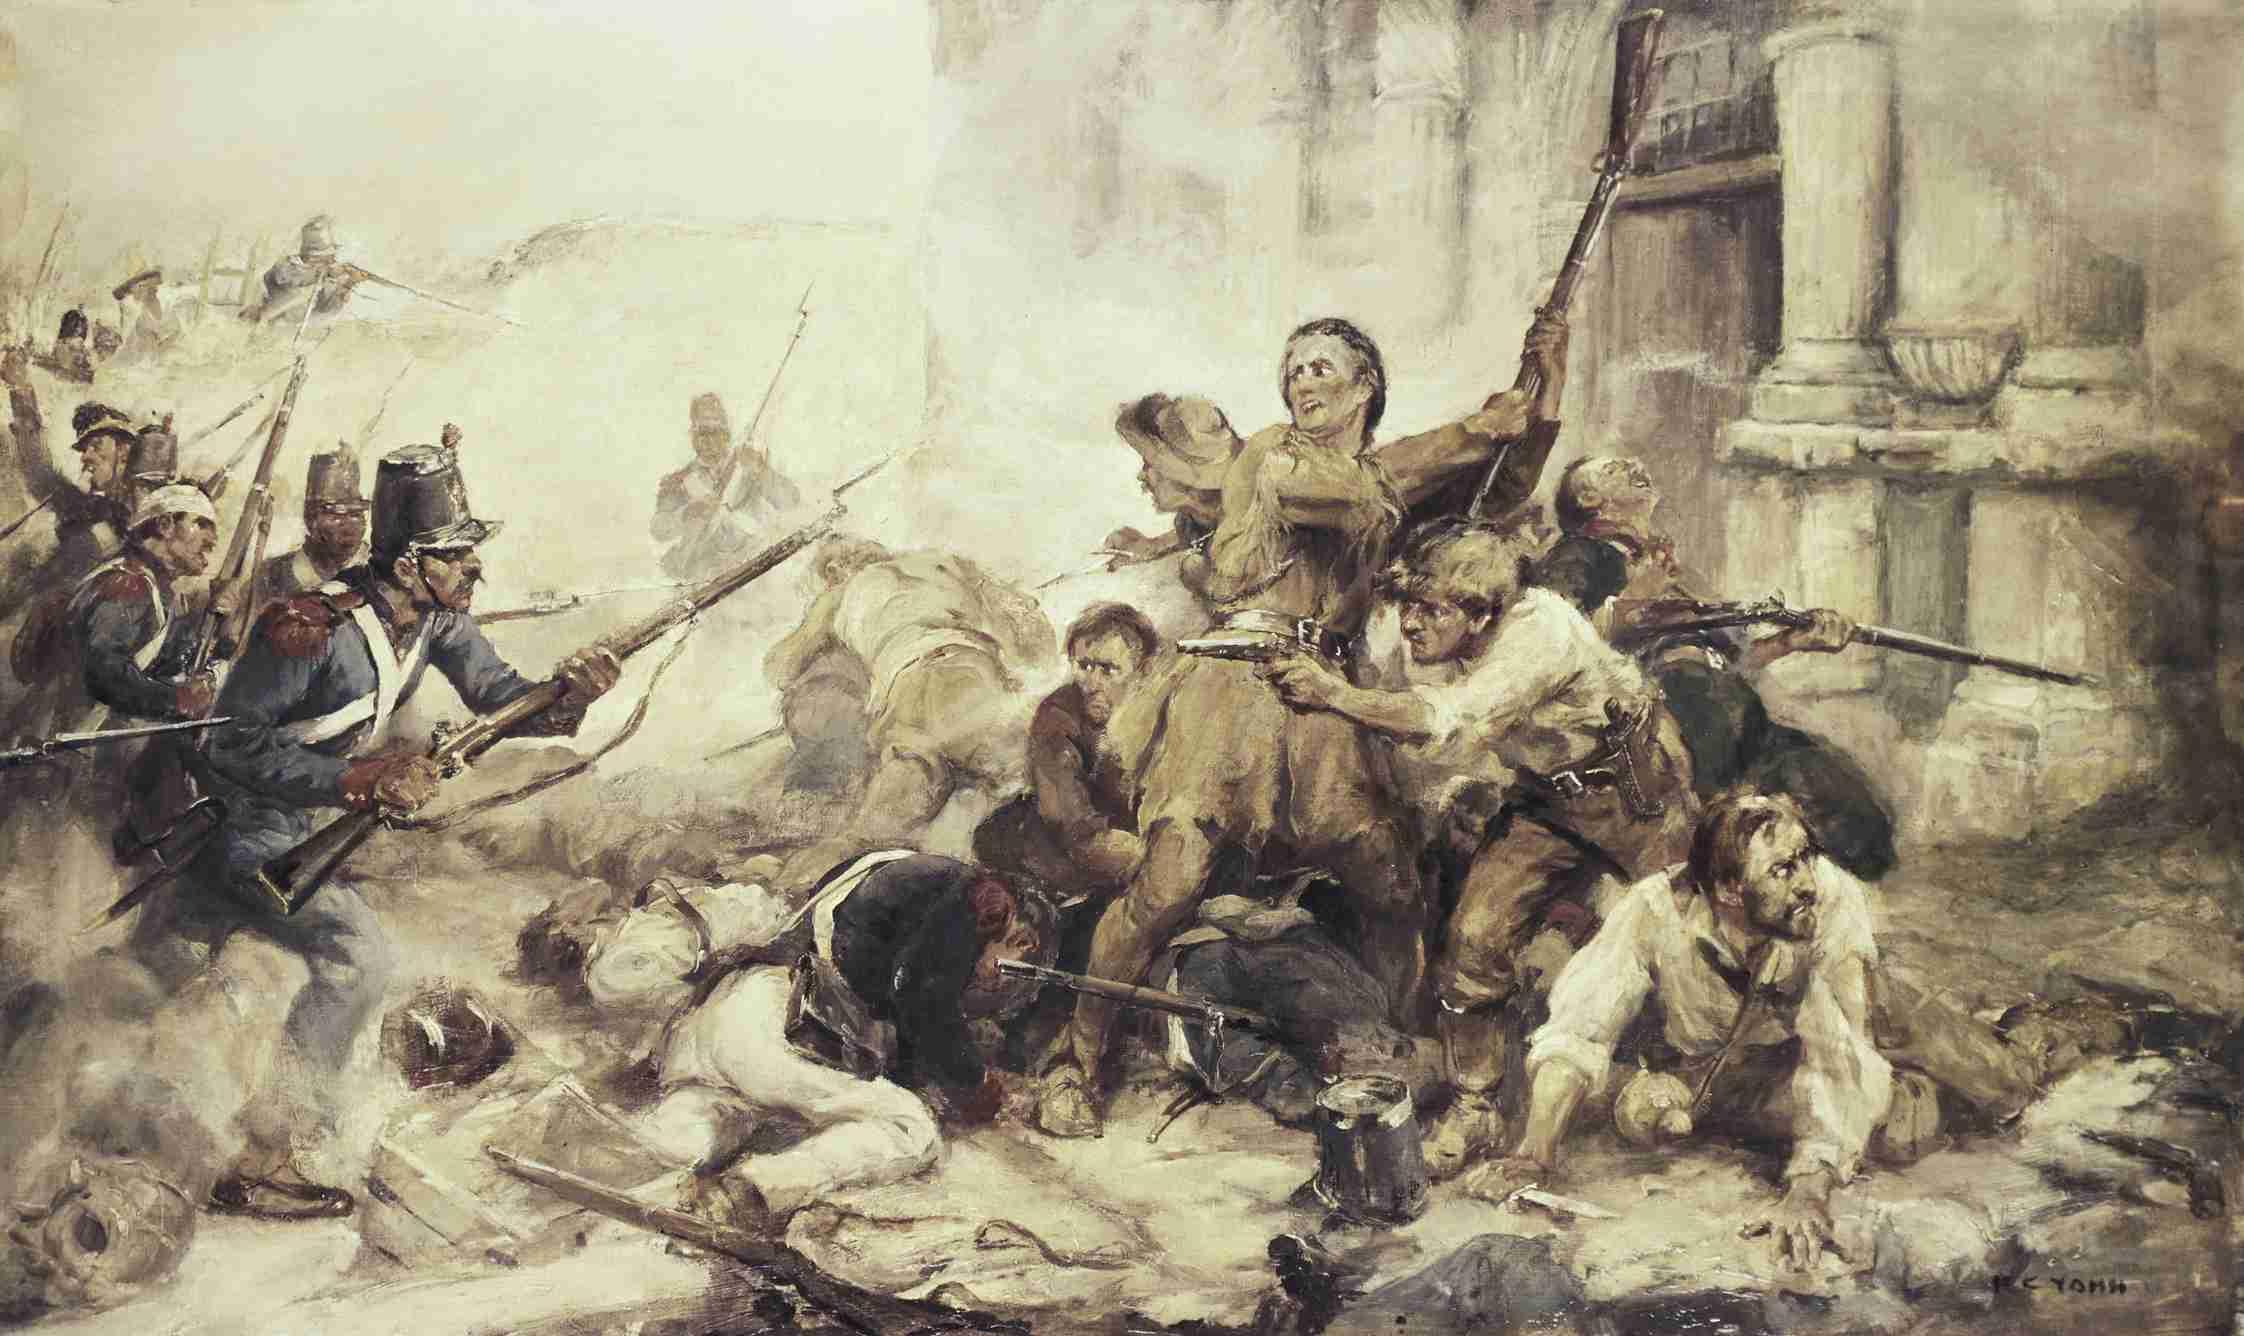 Battle of the Alamo artwork